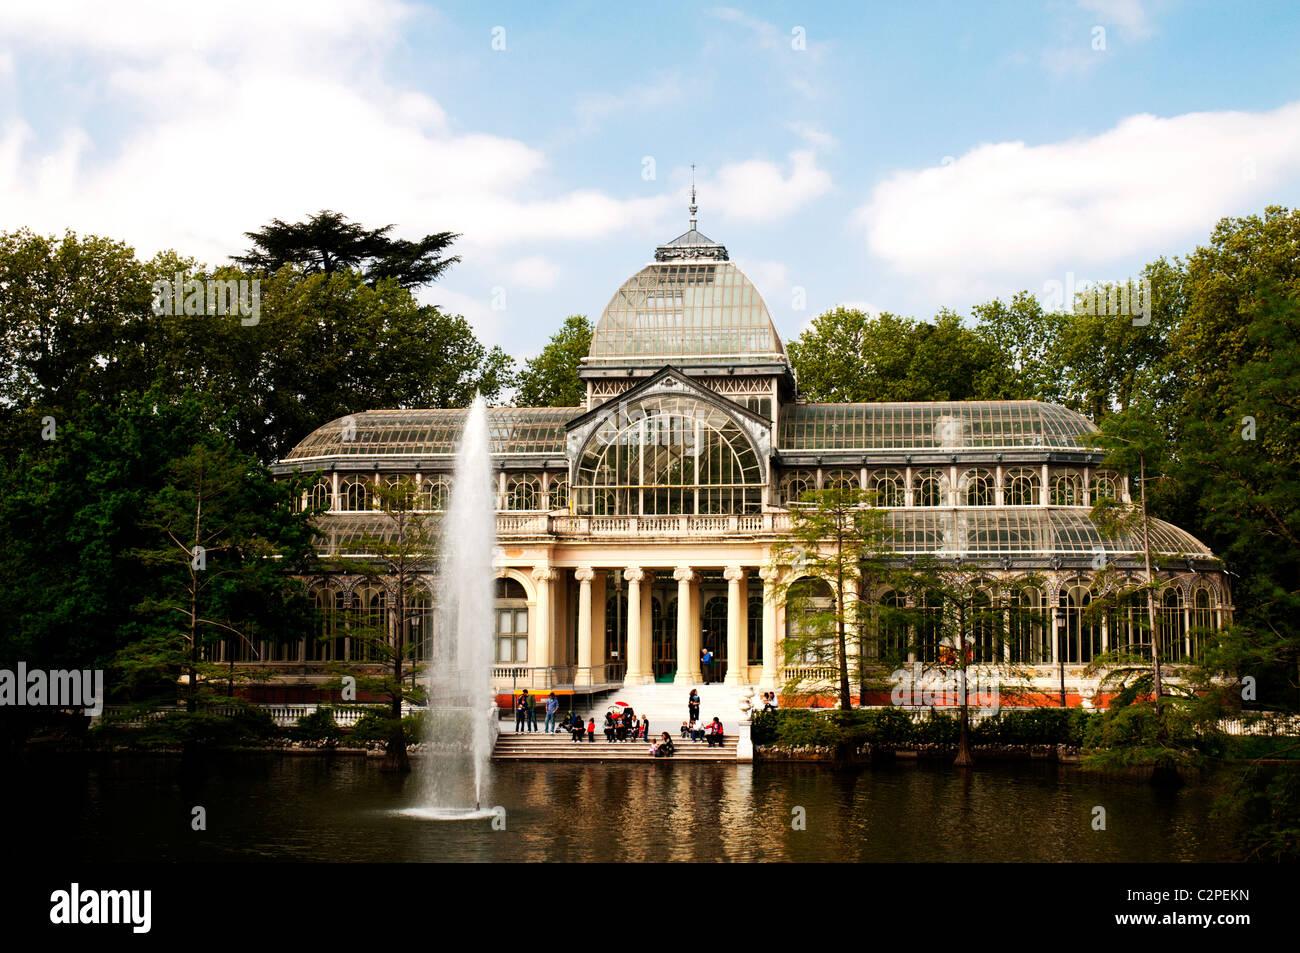 Palacio de Cristal, Madrid, Spain - Stock Image